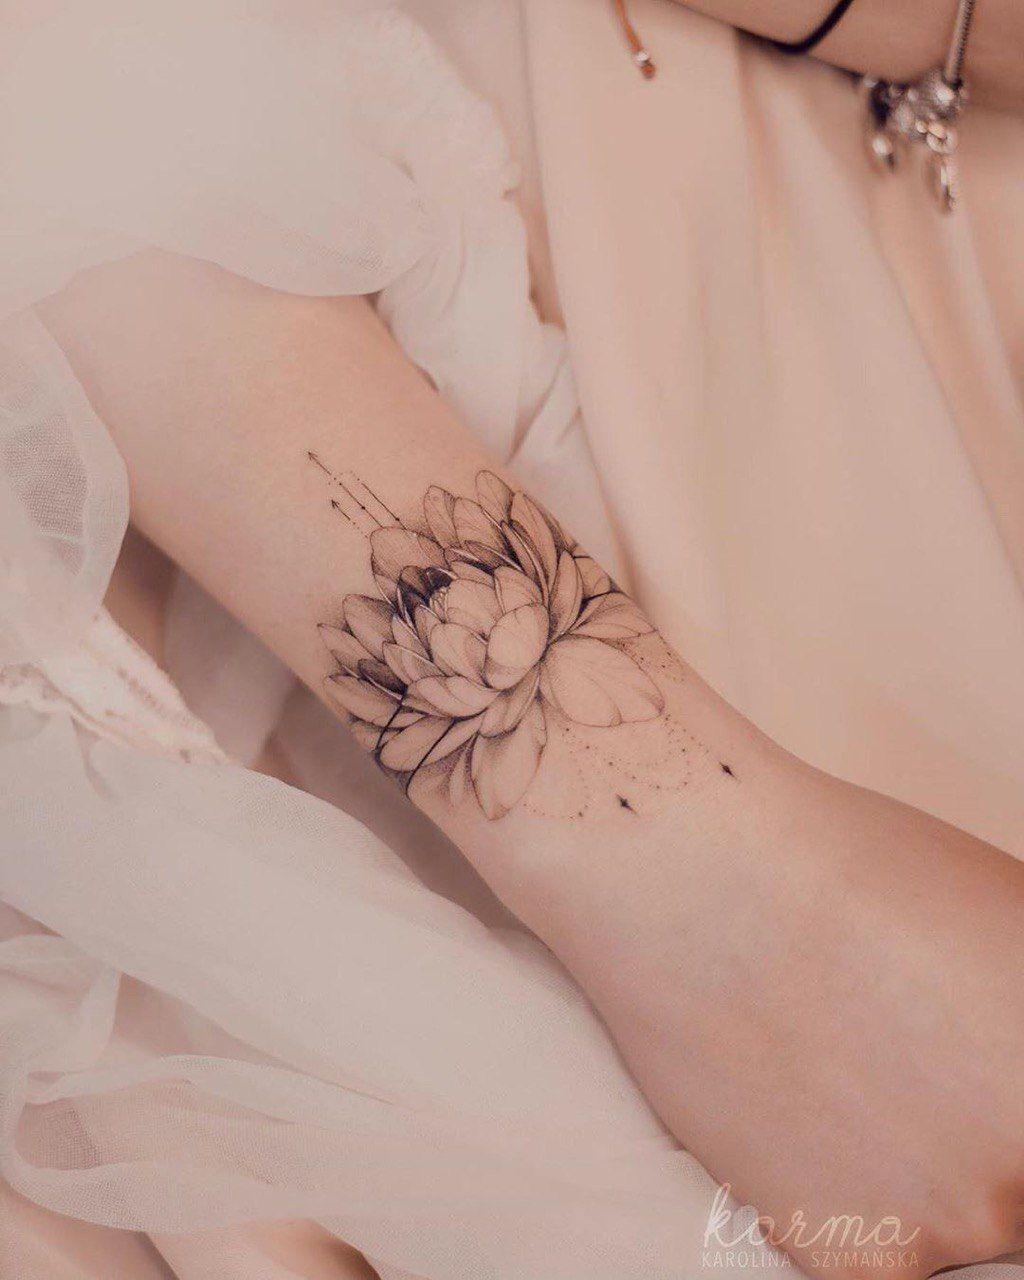 #polandtattoo#tattoopoland#warsawtattoo#tattoowarsaw#finelinetattoo#tattoofineline#fineline#flowerstattoo#handtattoo#girlytattoo